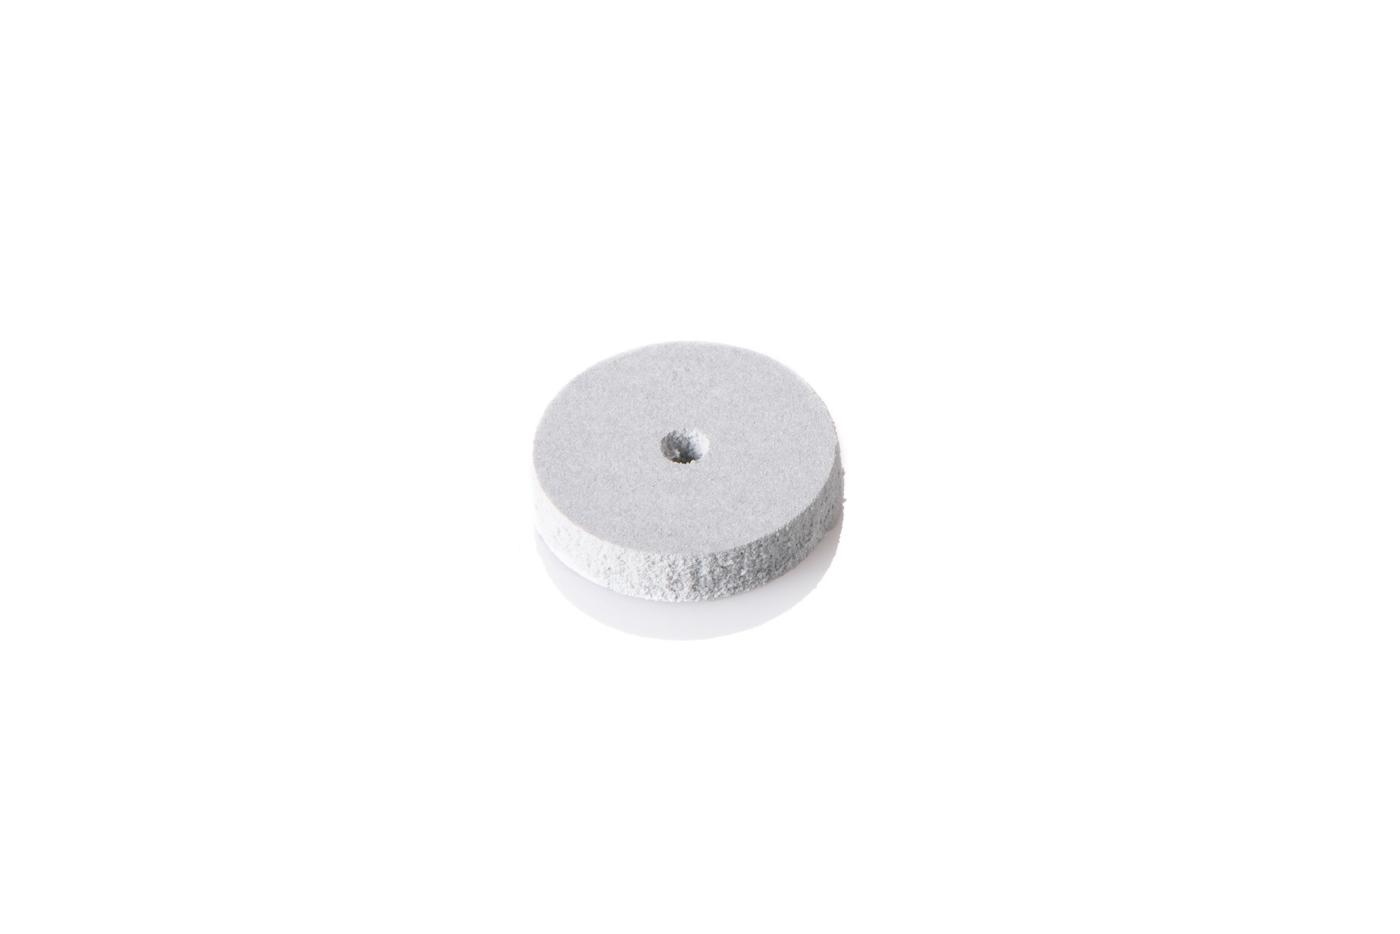 Pacific Abrasives Silicone Carbide Square Edge Wheels, 5/8